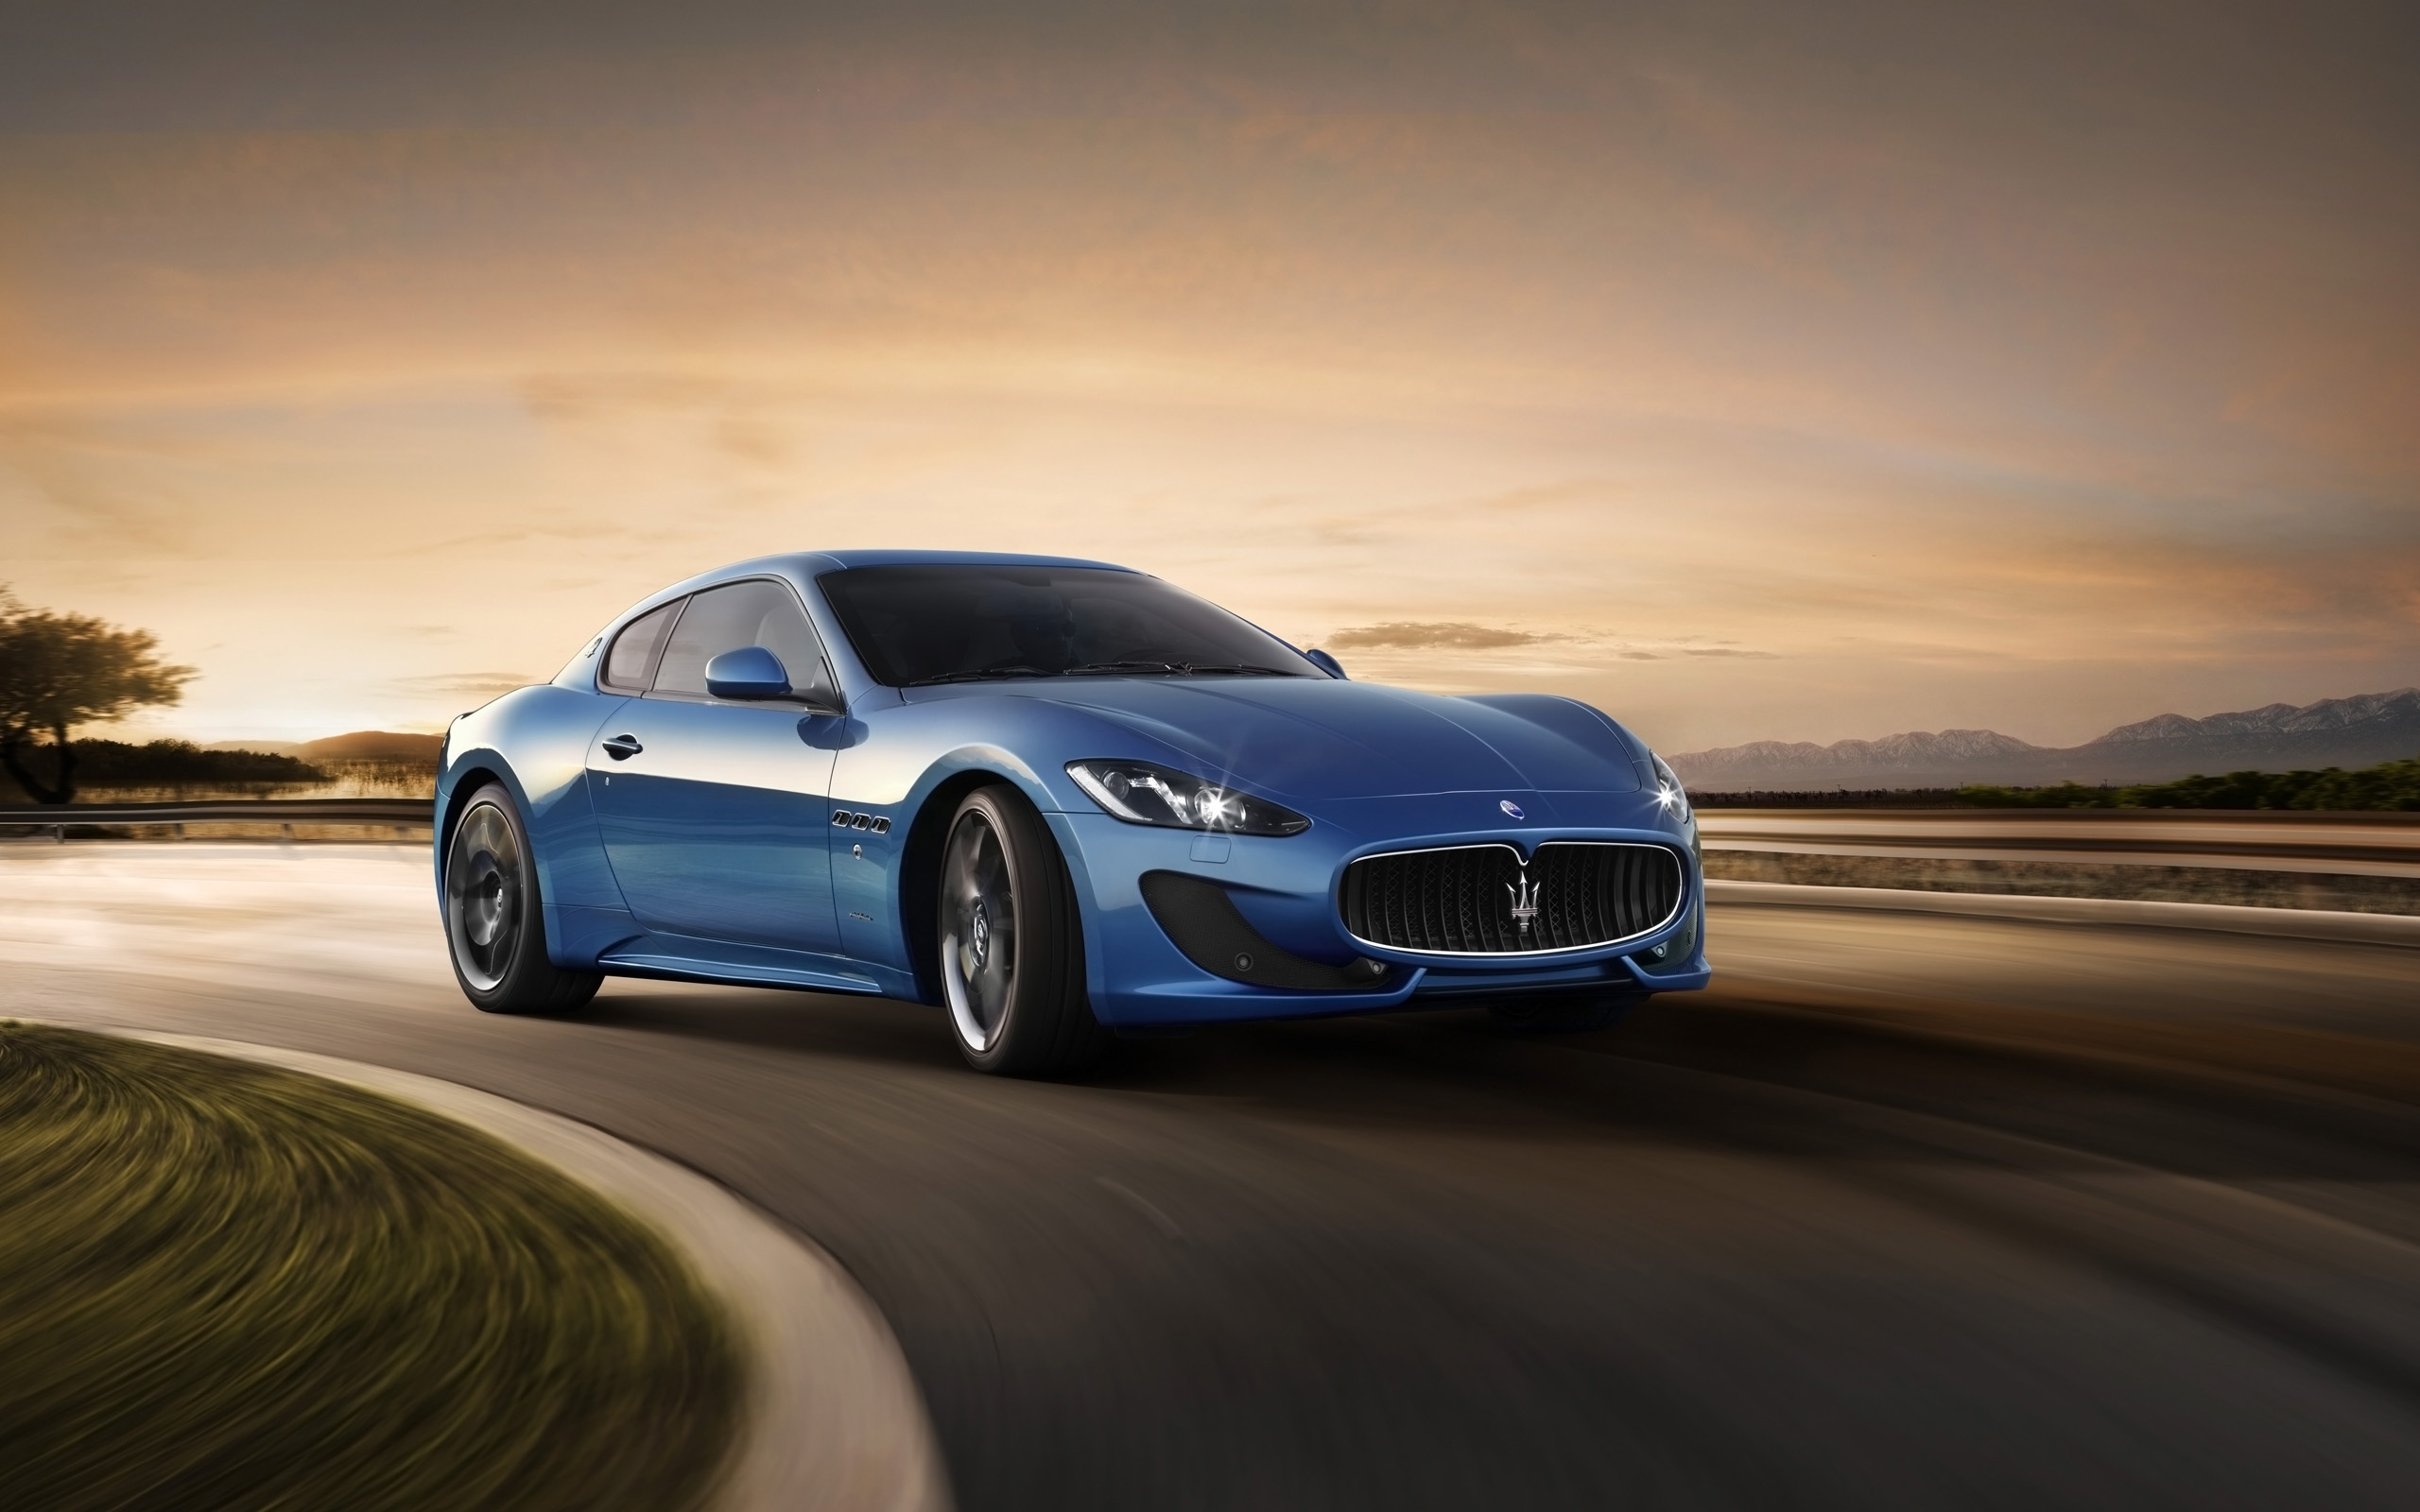 Gran Turismo Sport Iphone Wallpaper: Maserati GranTurismo Sport 2014 Wallpaper